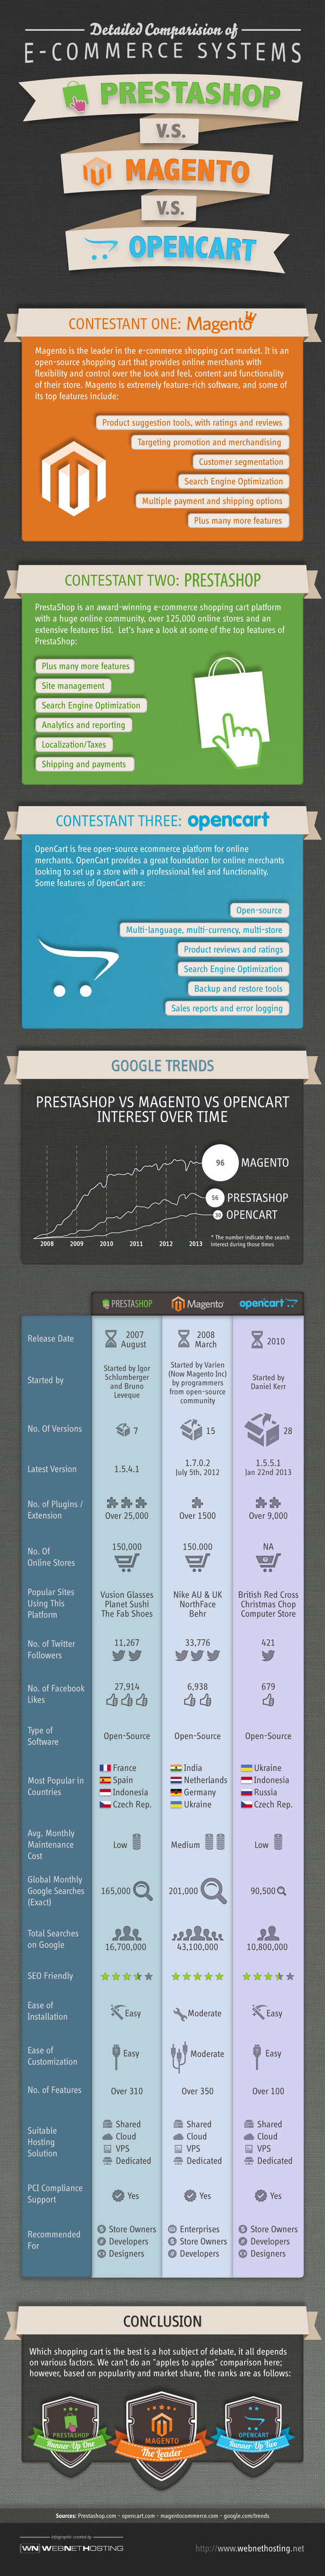 PrestaShop vs Magento vs OpenCart